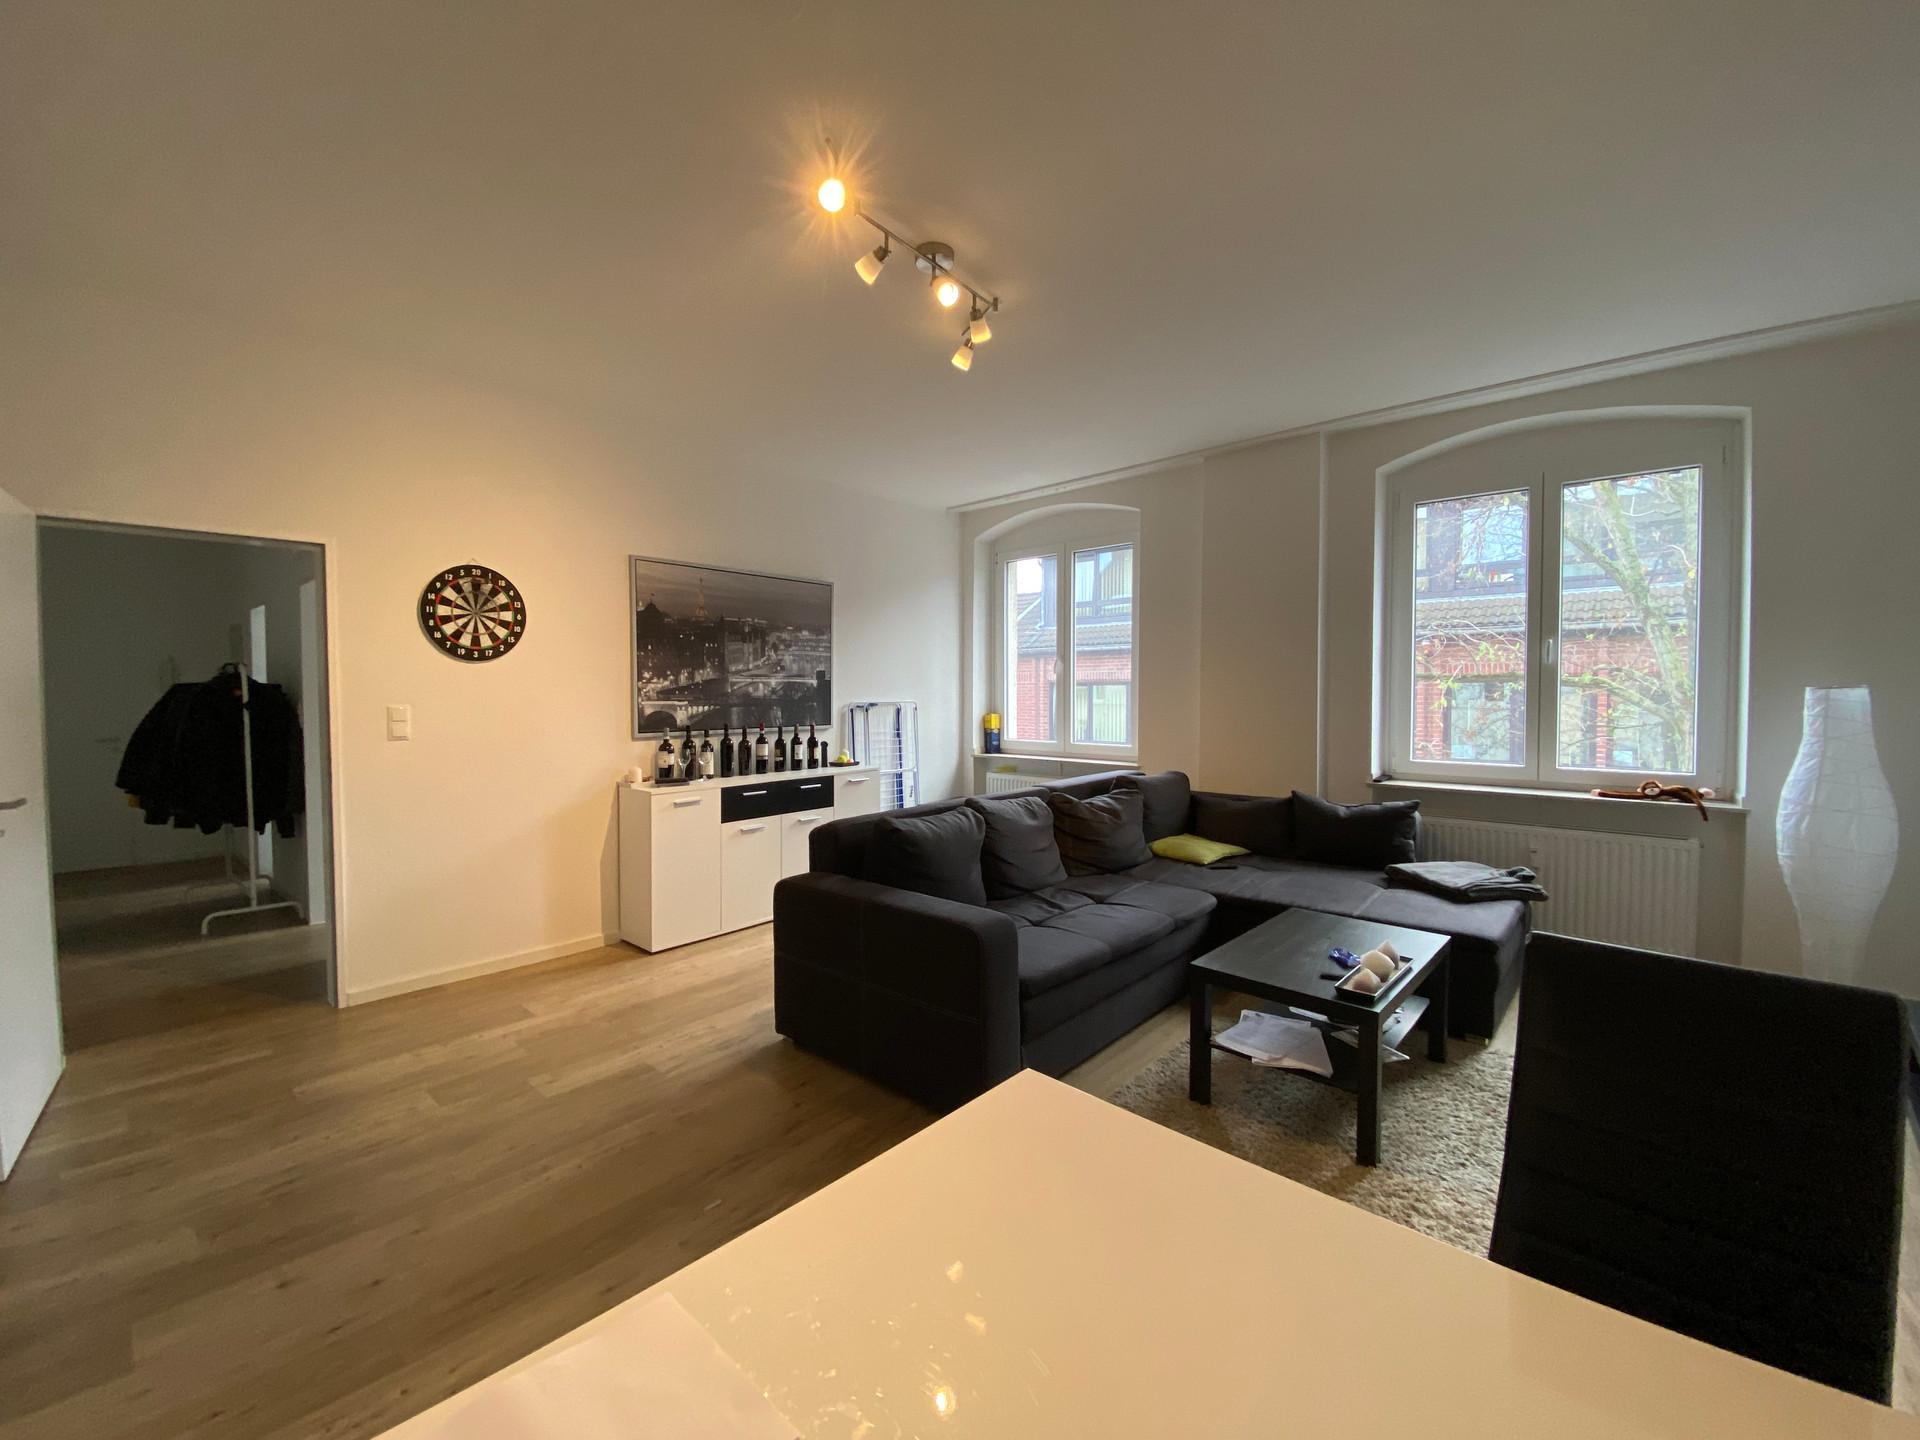 Großzügige & moderne 3-Zimmer-Wohnung inkl. Balkon in zentraler Innenstadtlage I Aachen-Zentrum